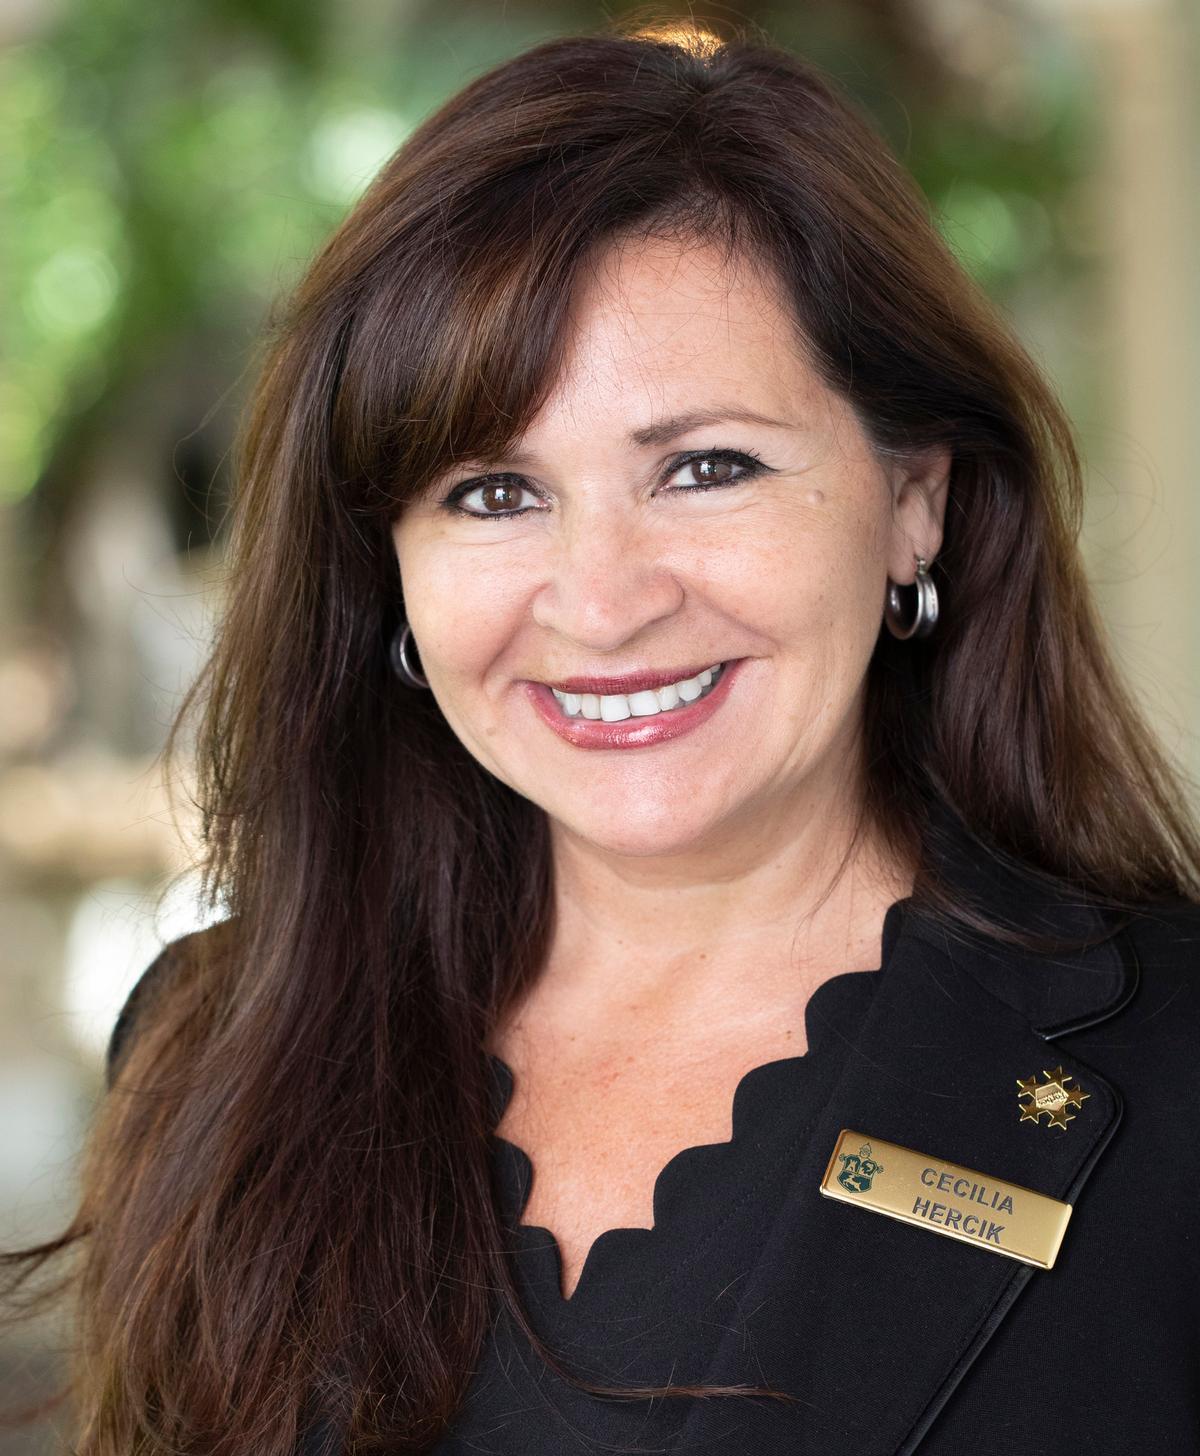 Cecilia Hercik has had a 25-year-career in the spa and wellness industry / Sea Island